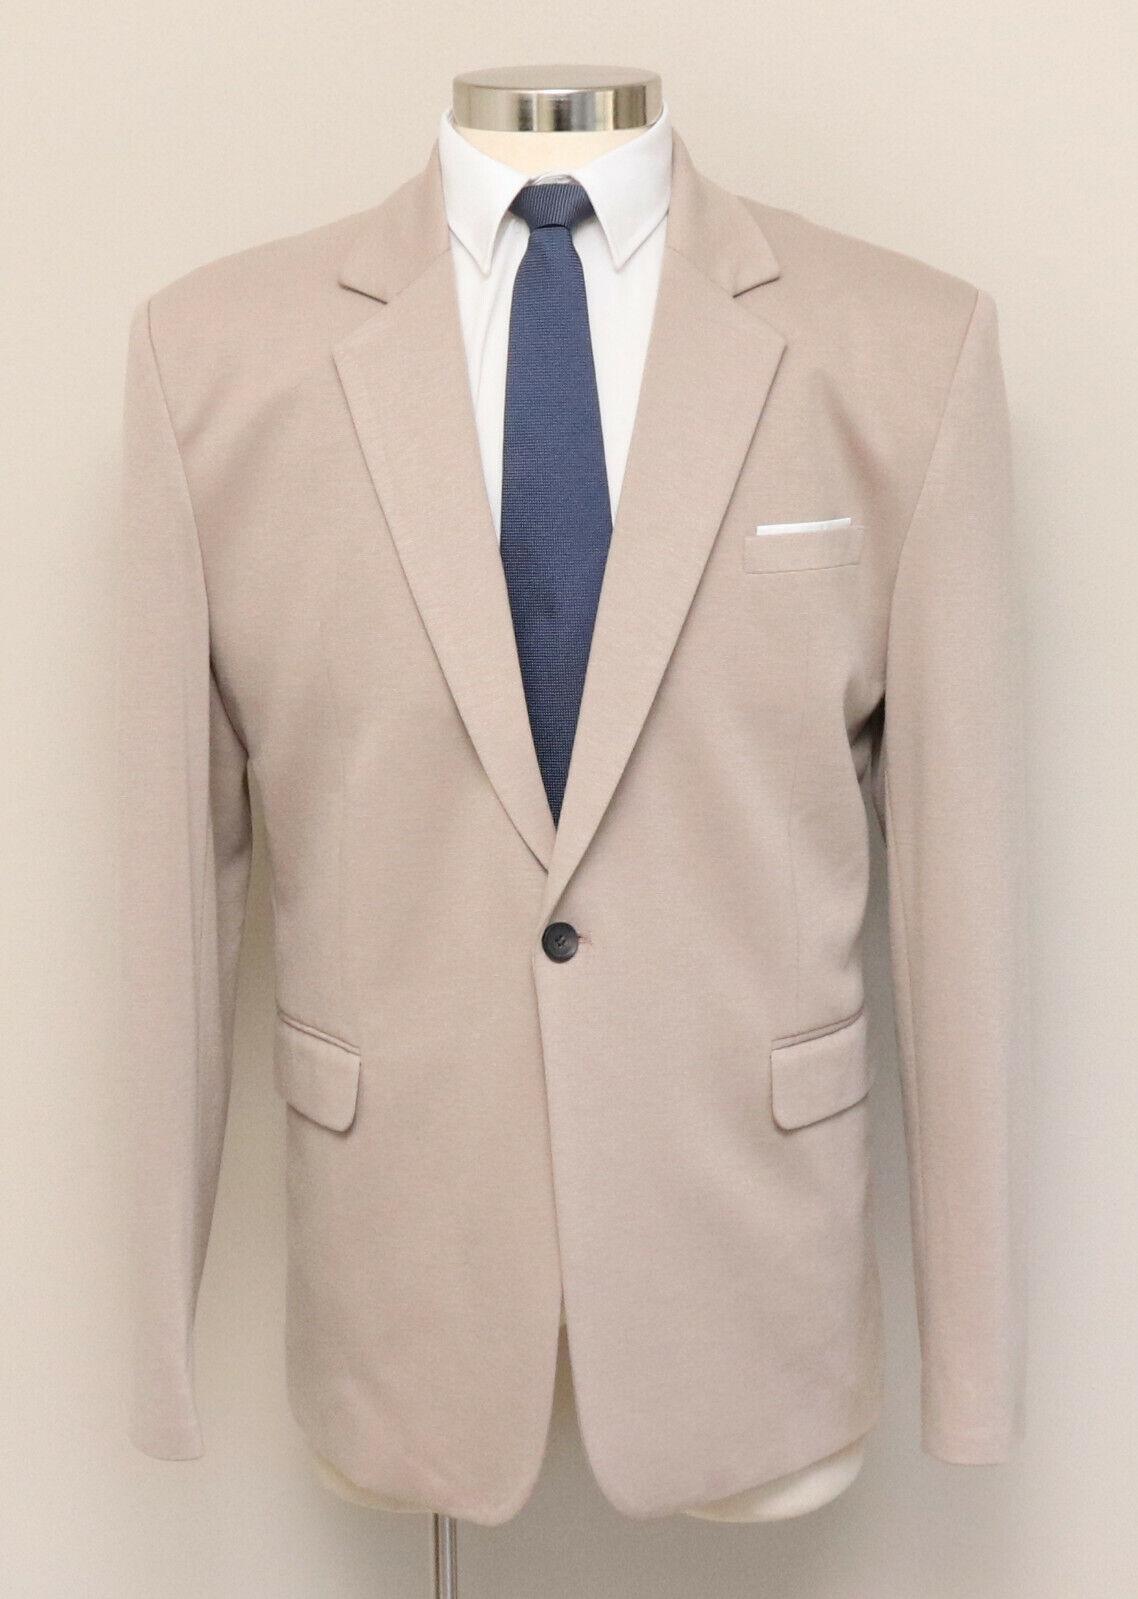 NWOT Mens XXL 46R Flatseven Tan One Button Blazer